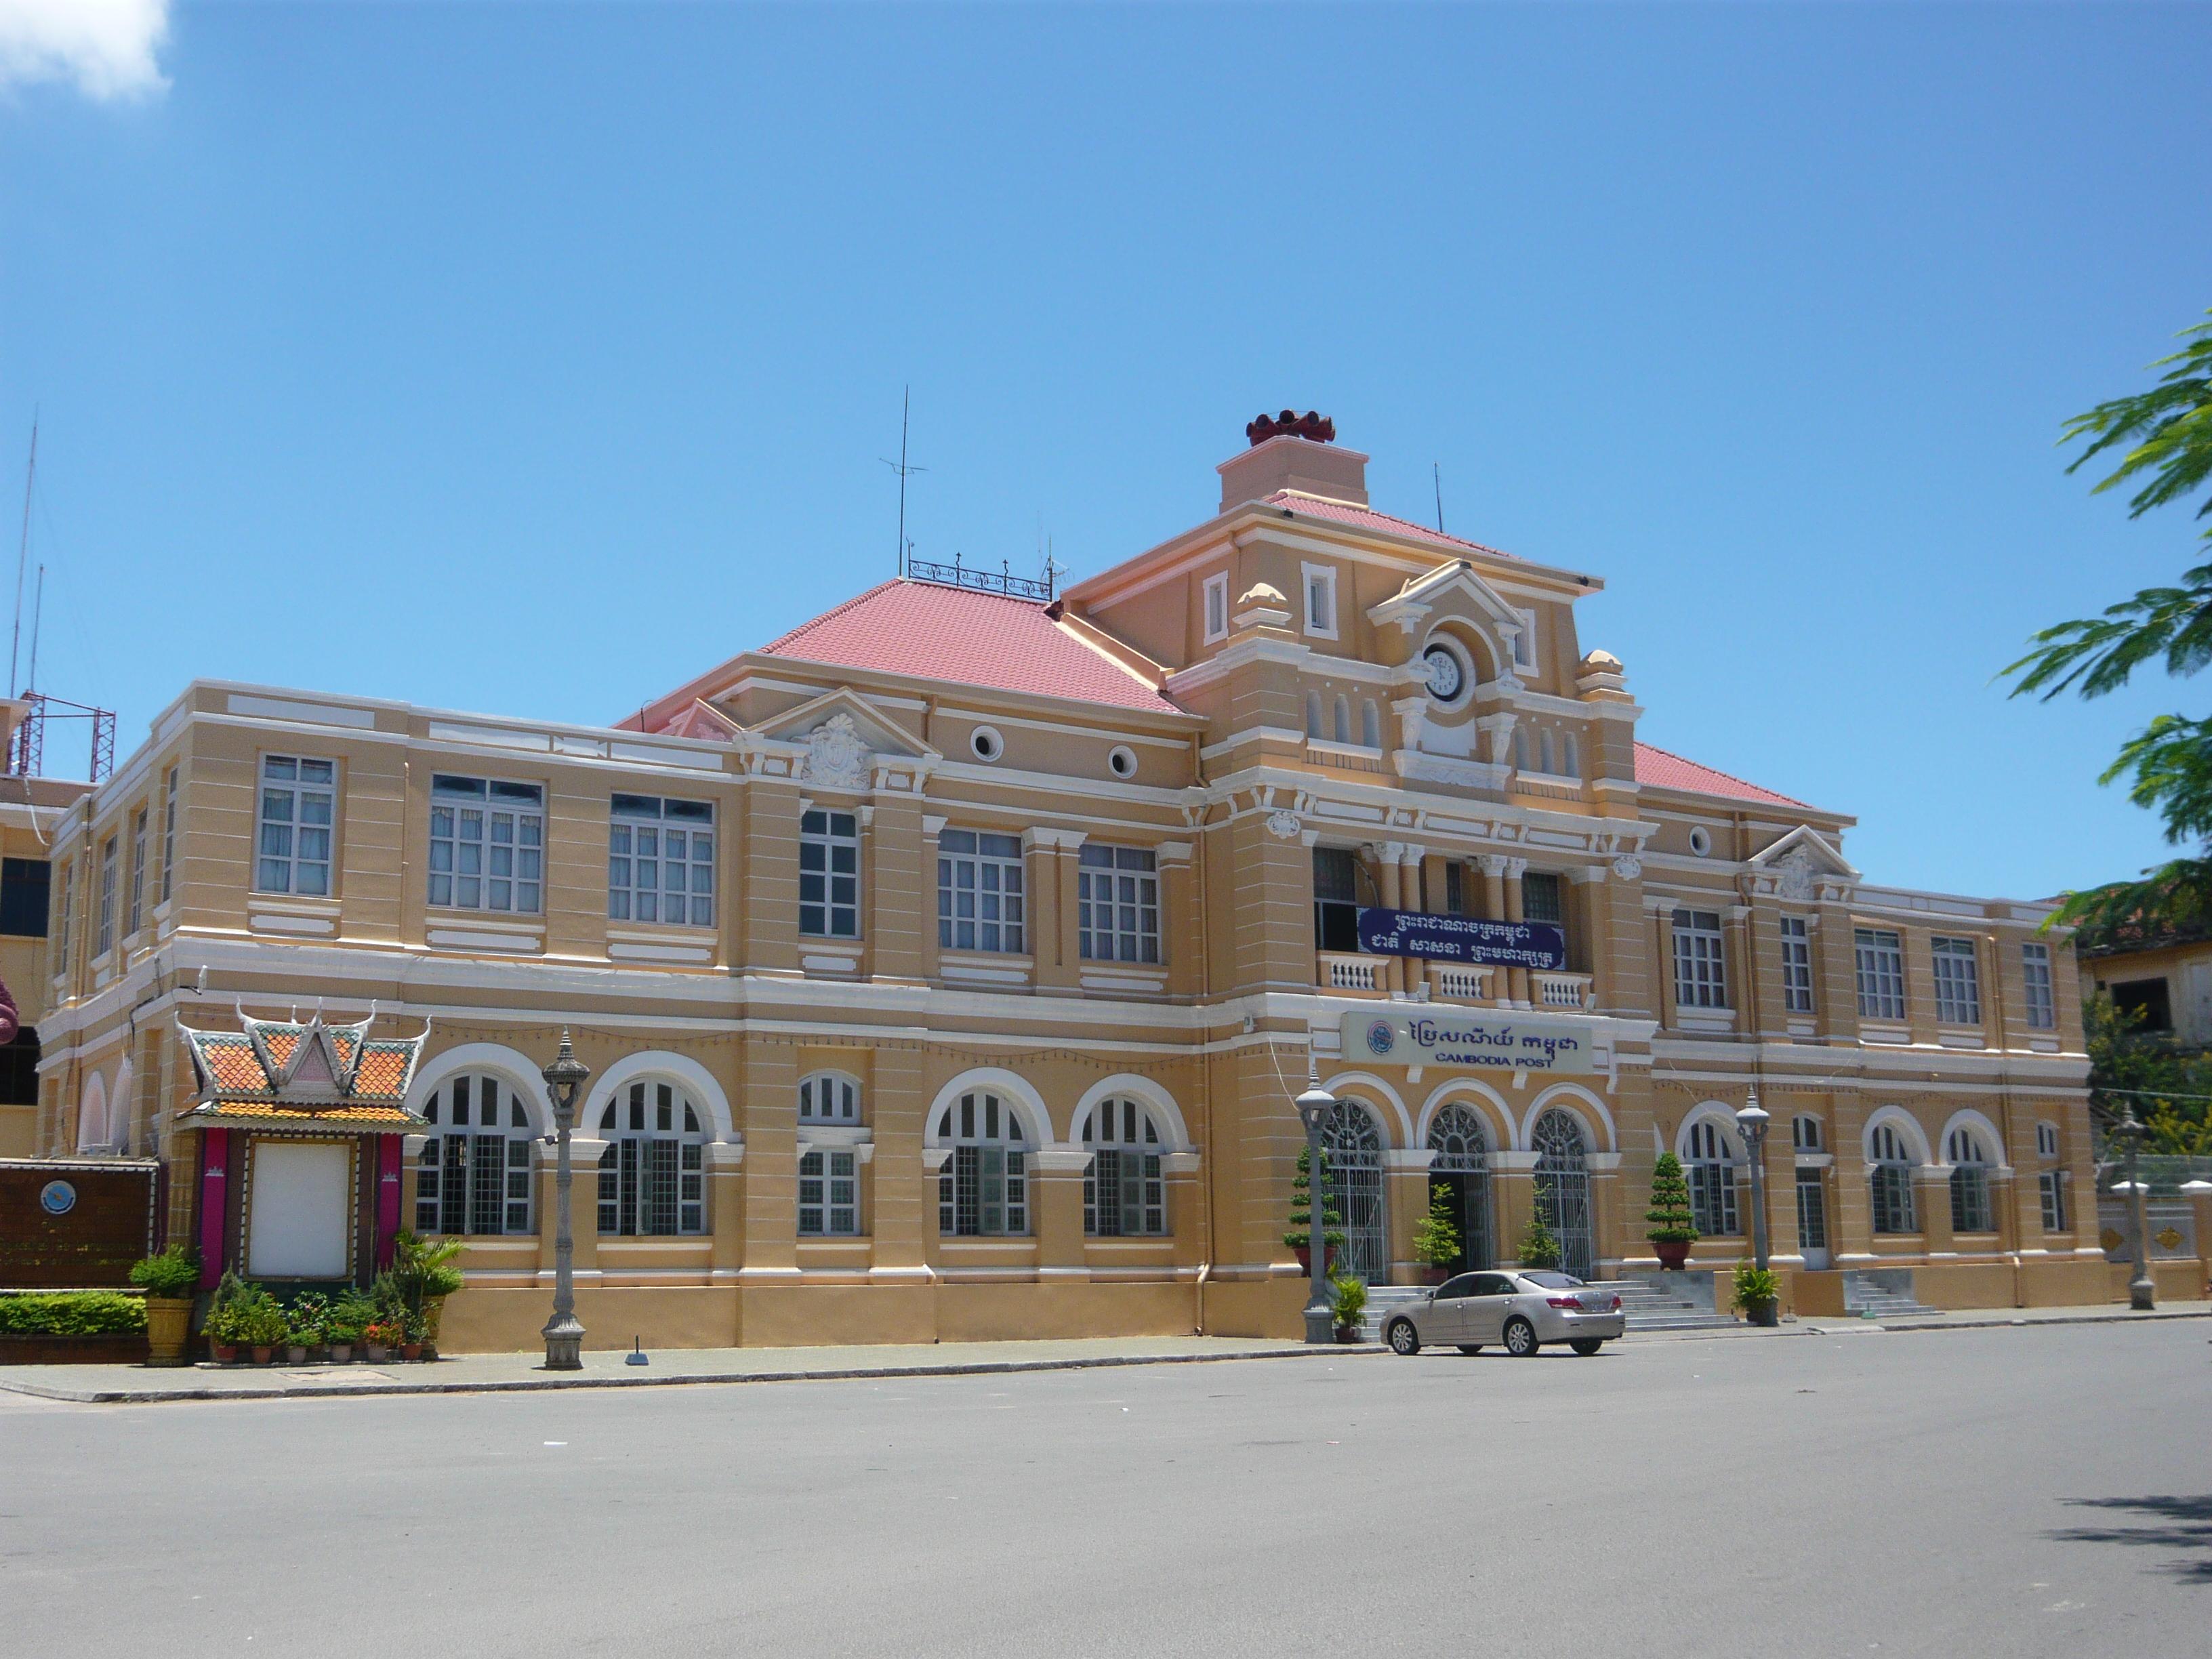 Travel from wat phnom to post office phnom penh